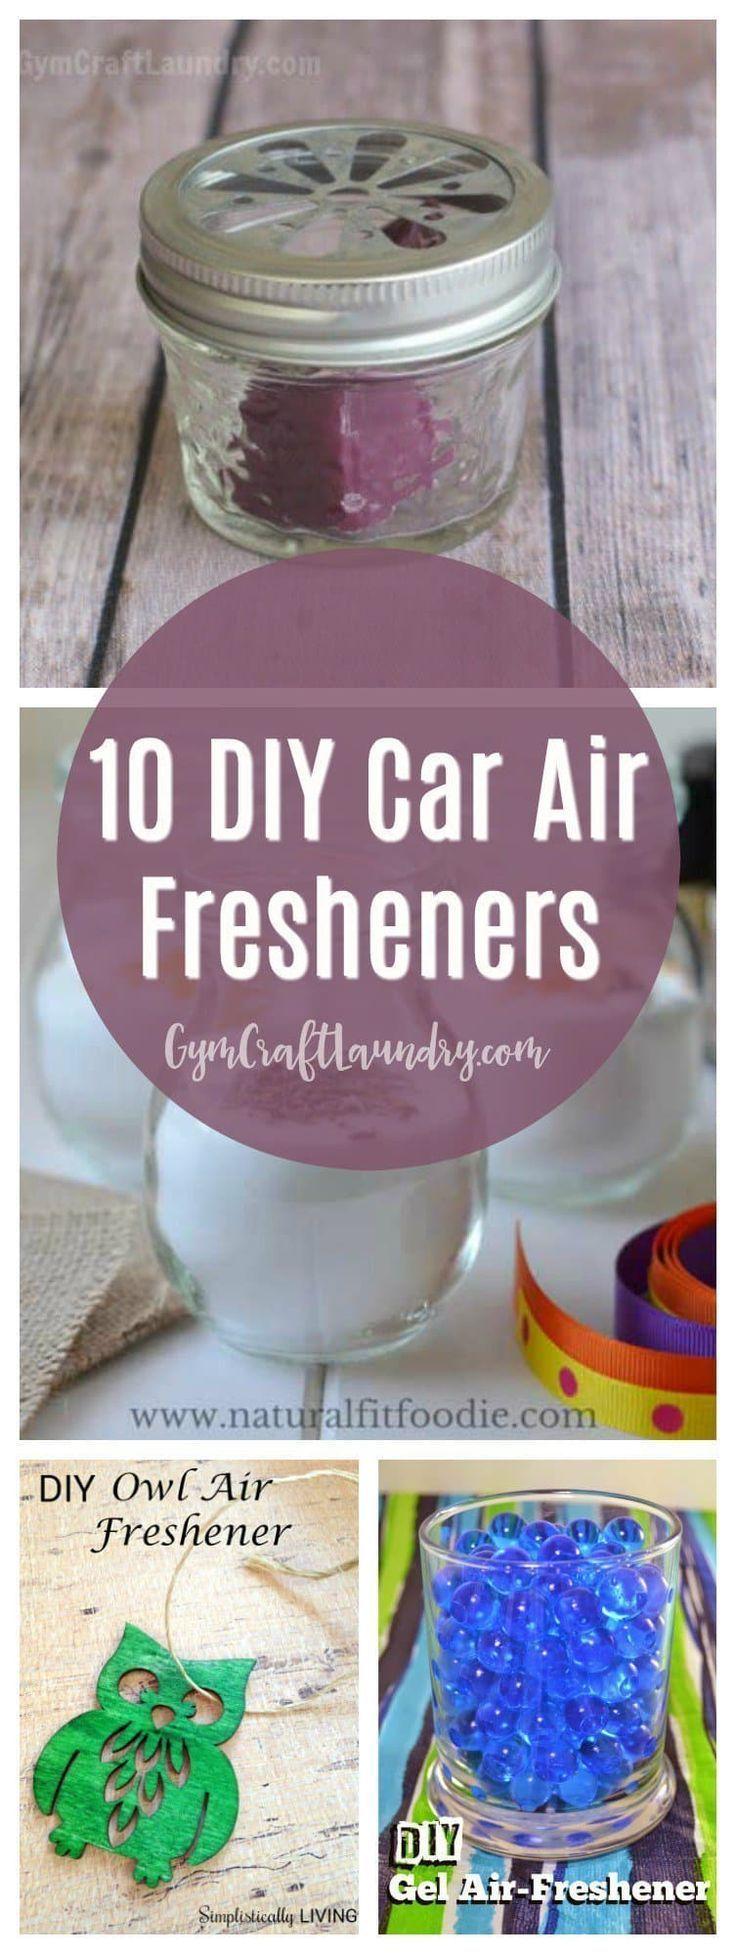 Top 10 Best Car Air Freshener Idea Wardrobe Shoe Toilet Room Essential Oil Scented Wom Homemade Air Freshener Diy Air Freshener Car Air Freshener